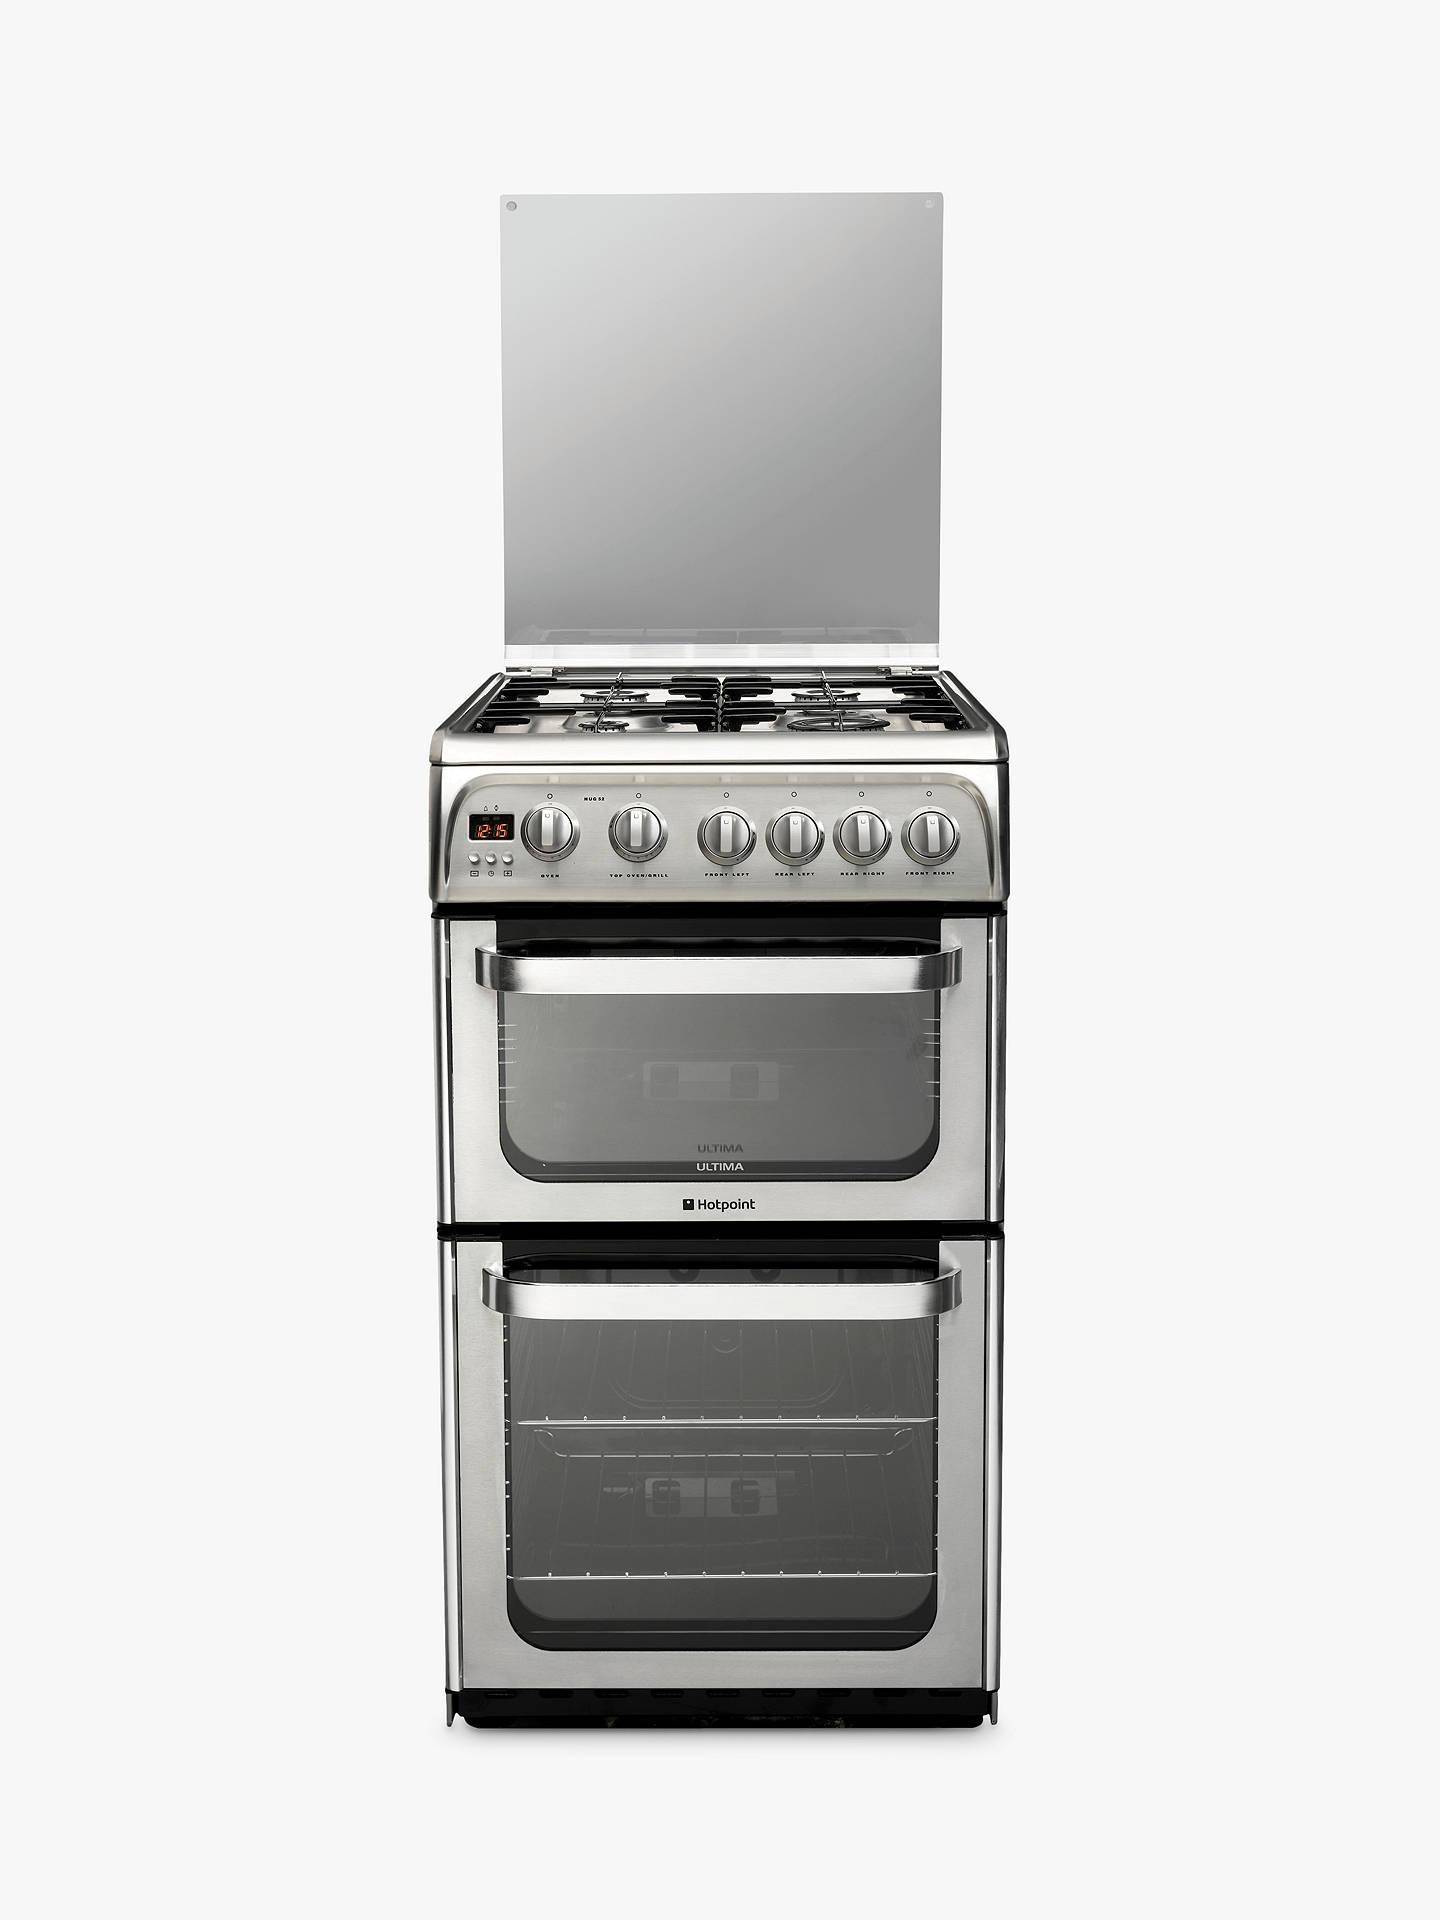 hotpoint ultima hug52x gas cooker stainless steel at john. Black Bedroom Furniture Sets. Home Design Ideas